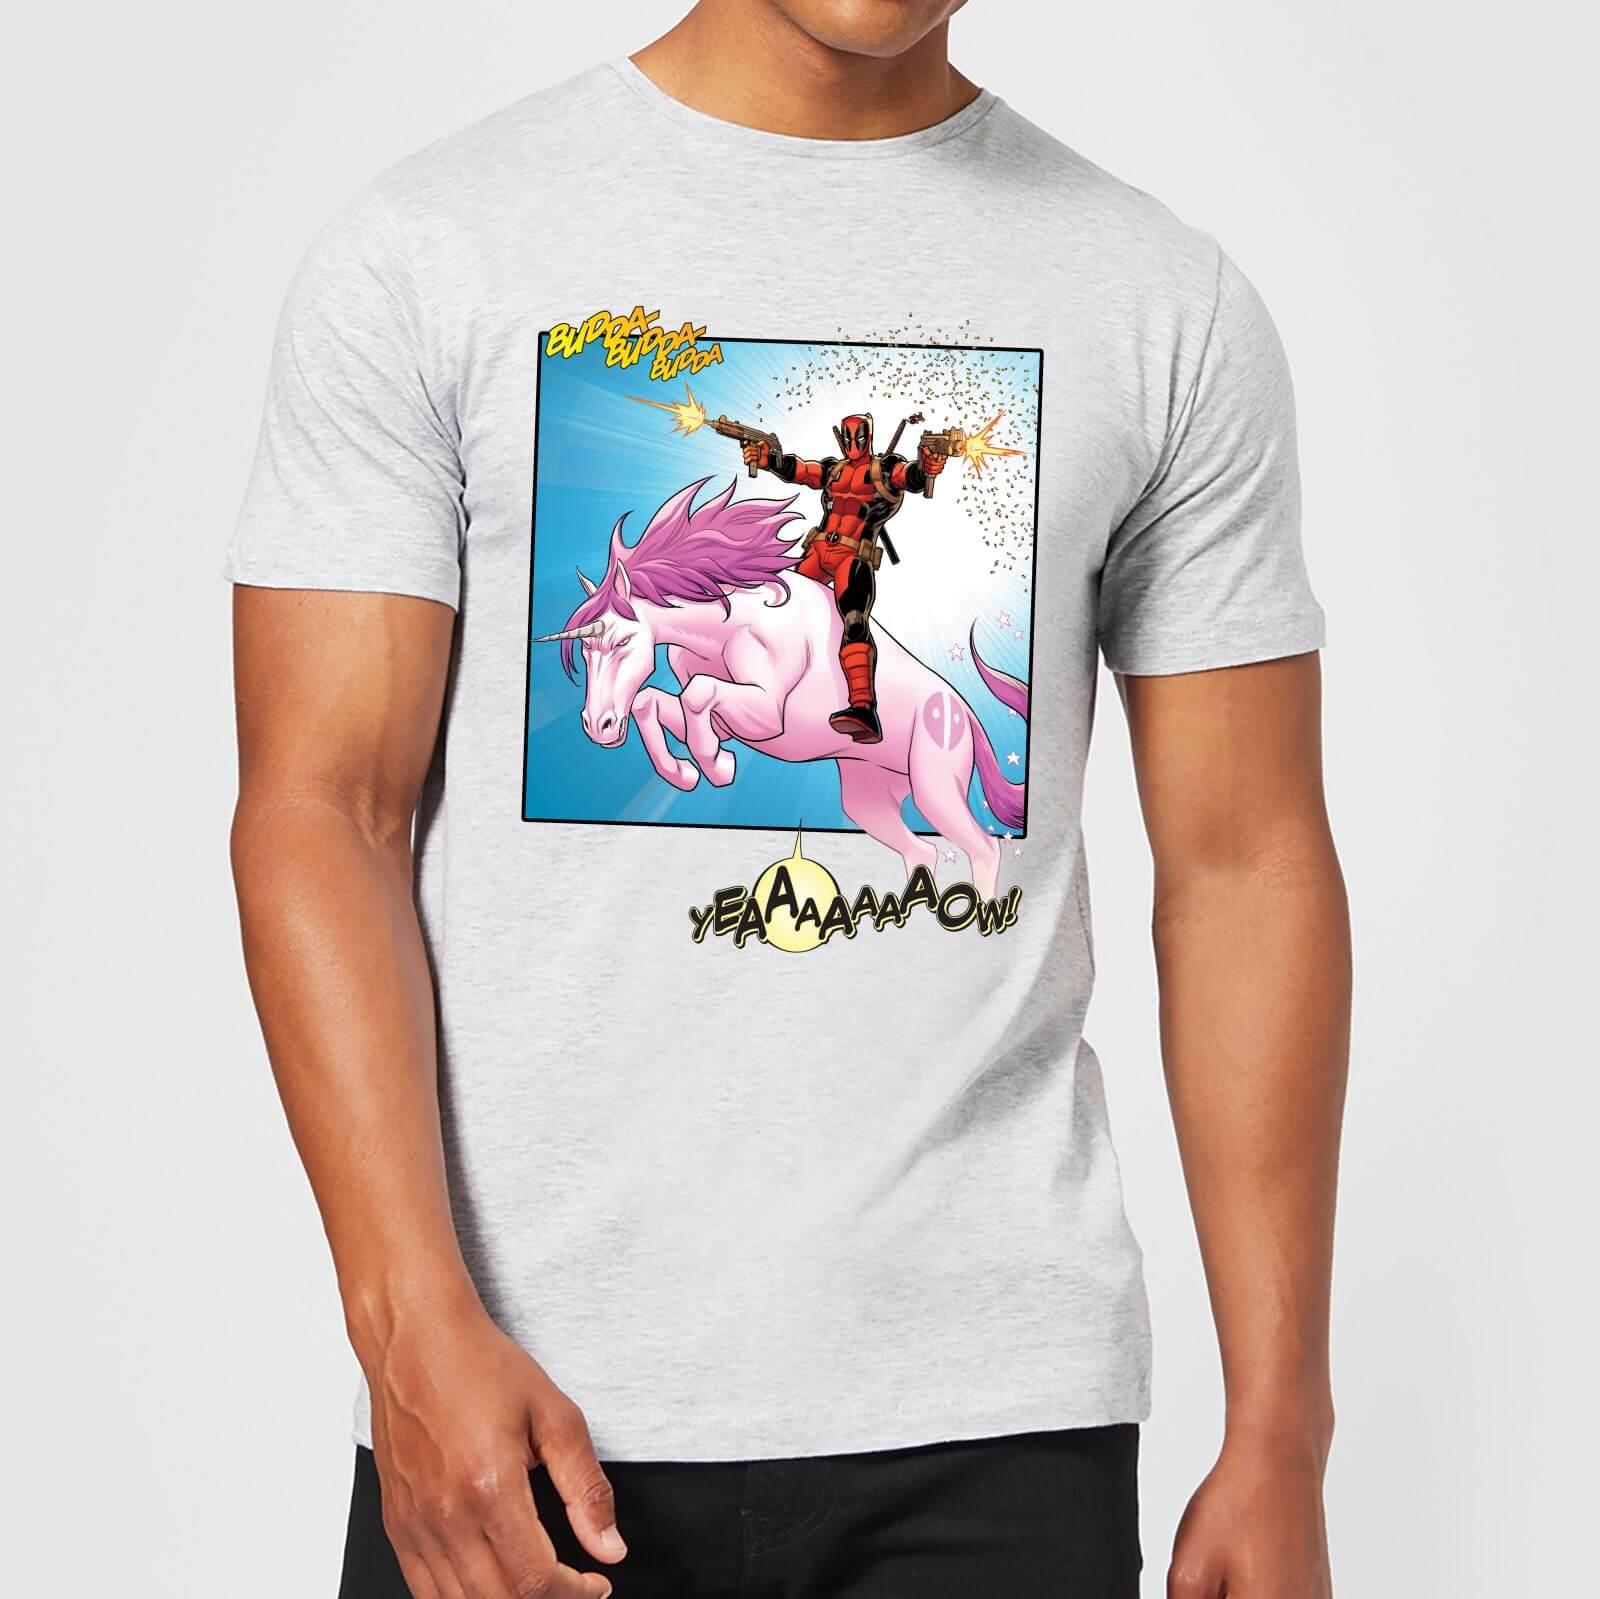 OfferteWeb.click 35-t-shirt-marvel-deadpool-unicorn-battle-grigio-uomo-xxl